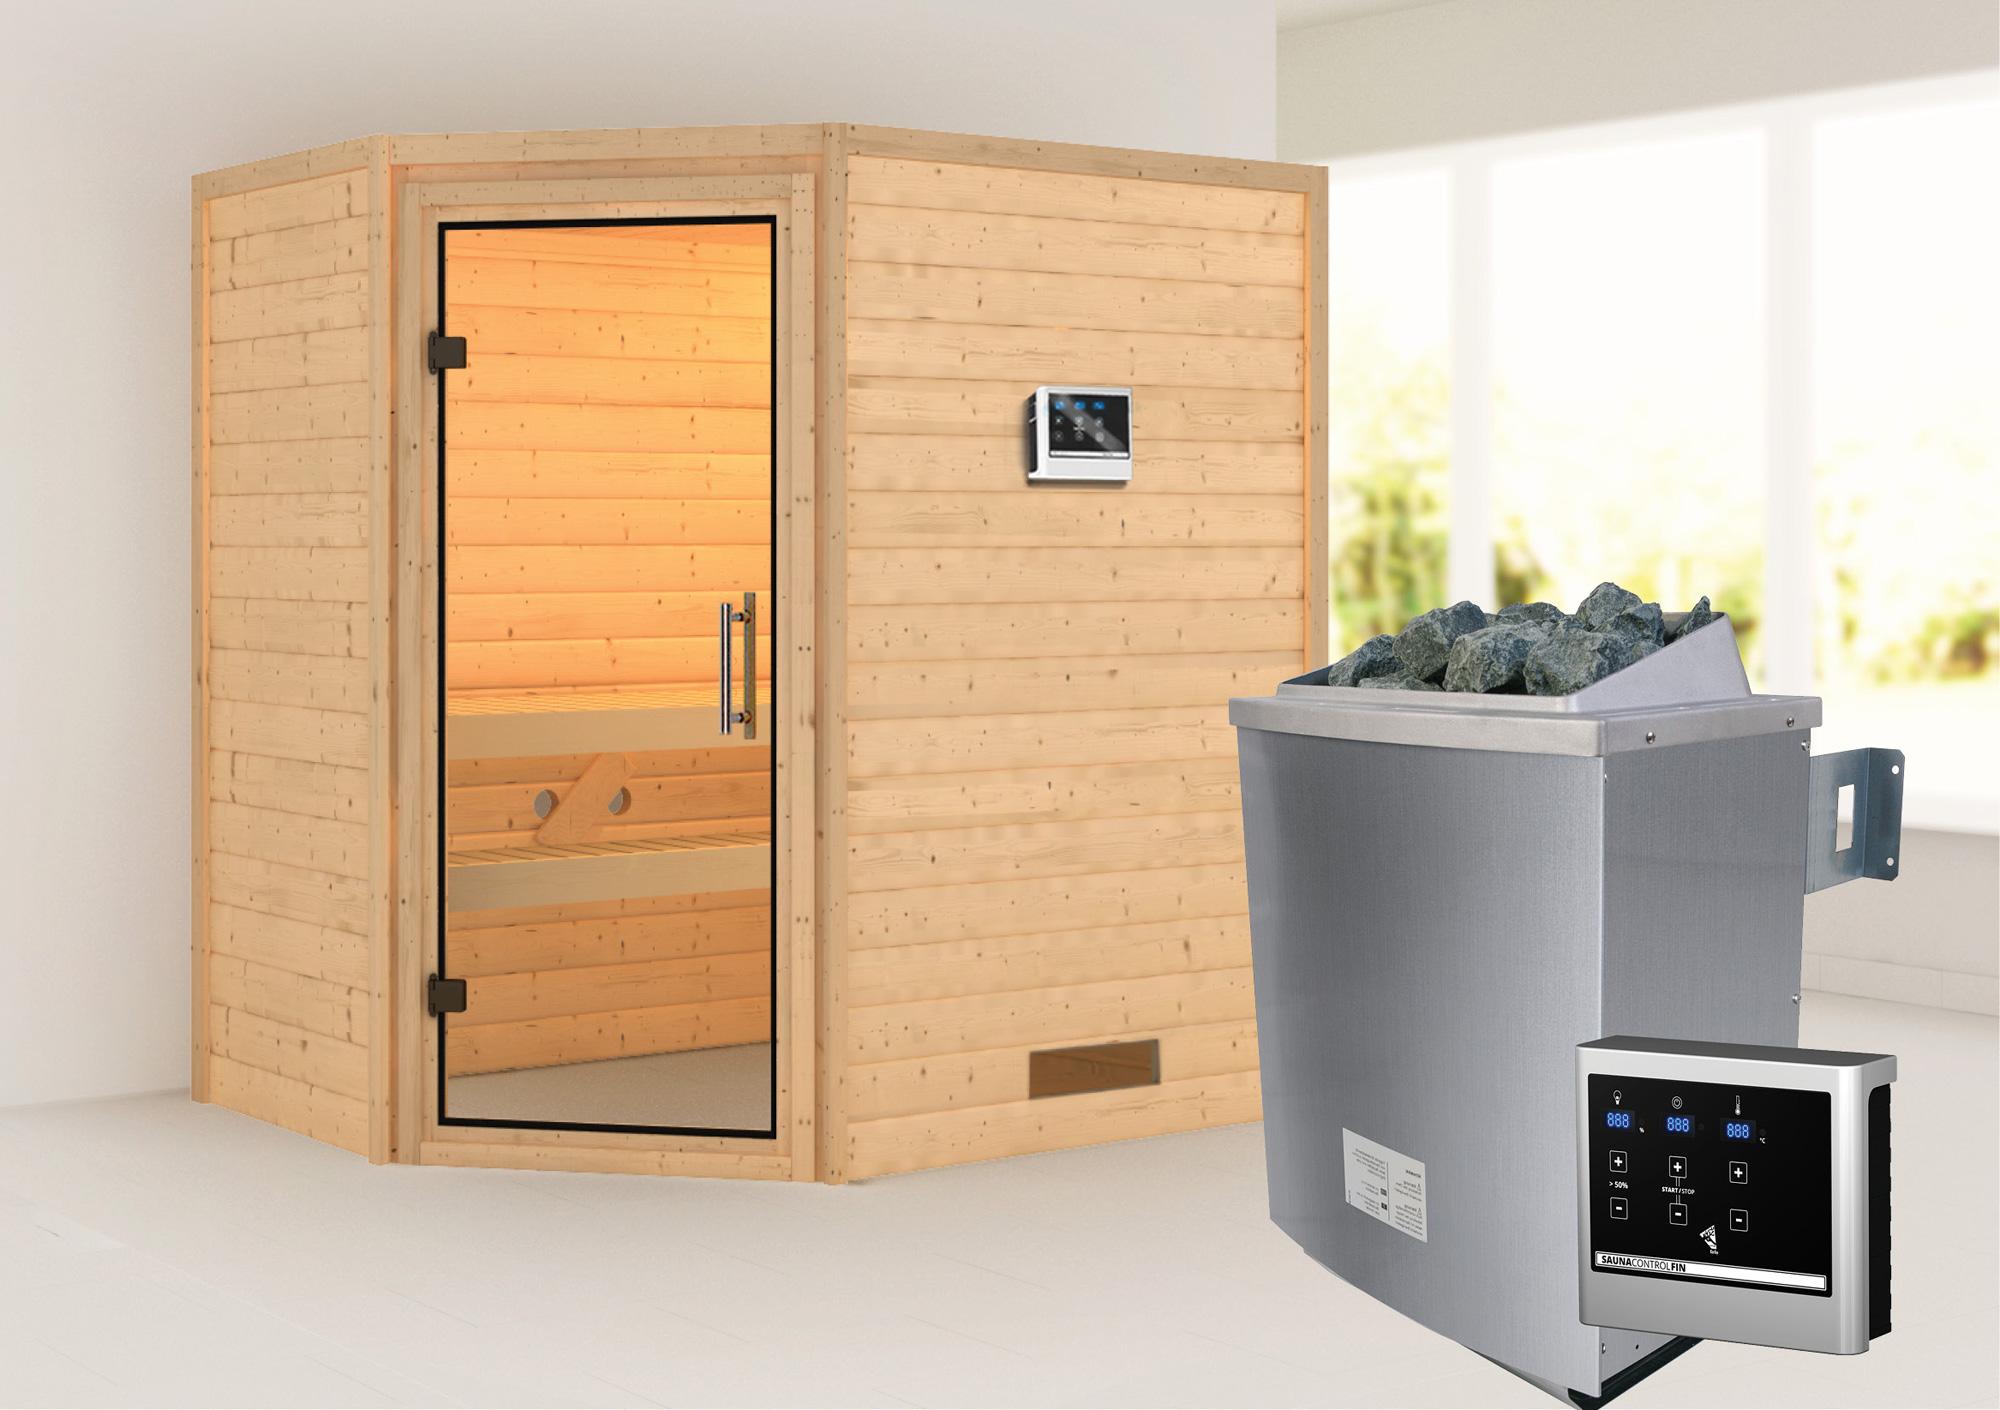 WoodFeeling Sauna Svea 38mm mit Saunaofen 9 kW extern Klarglas Tür Bild 1